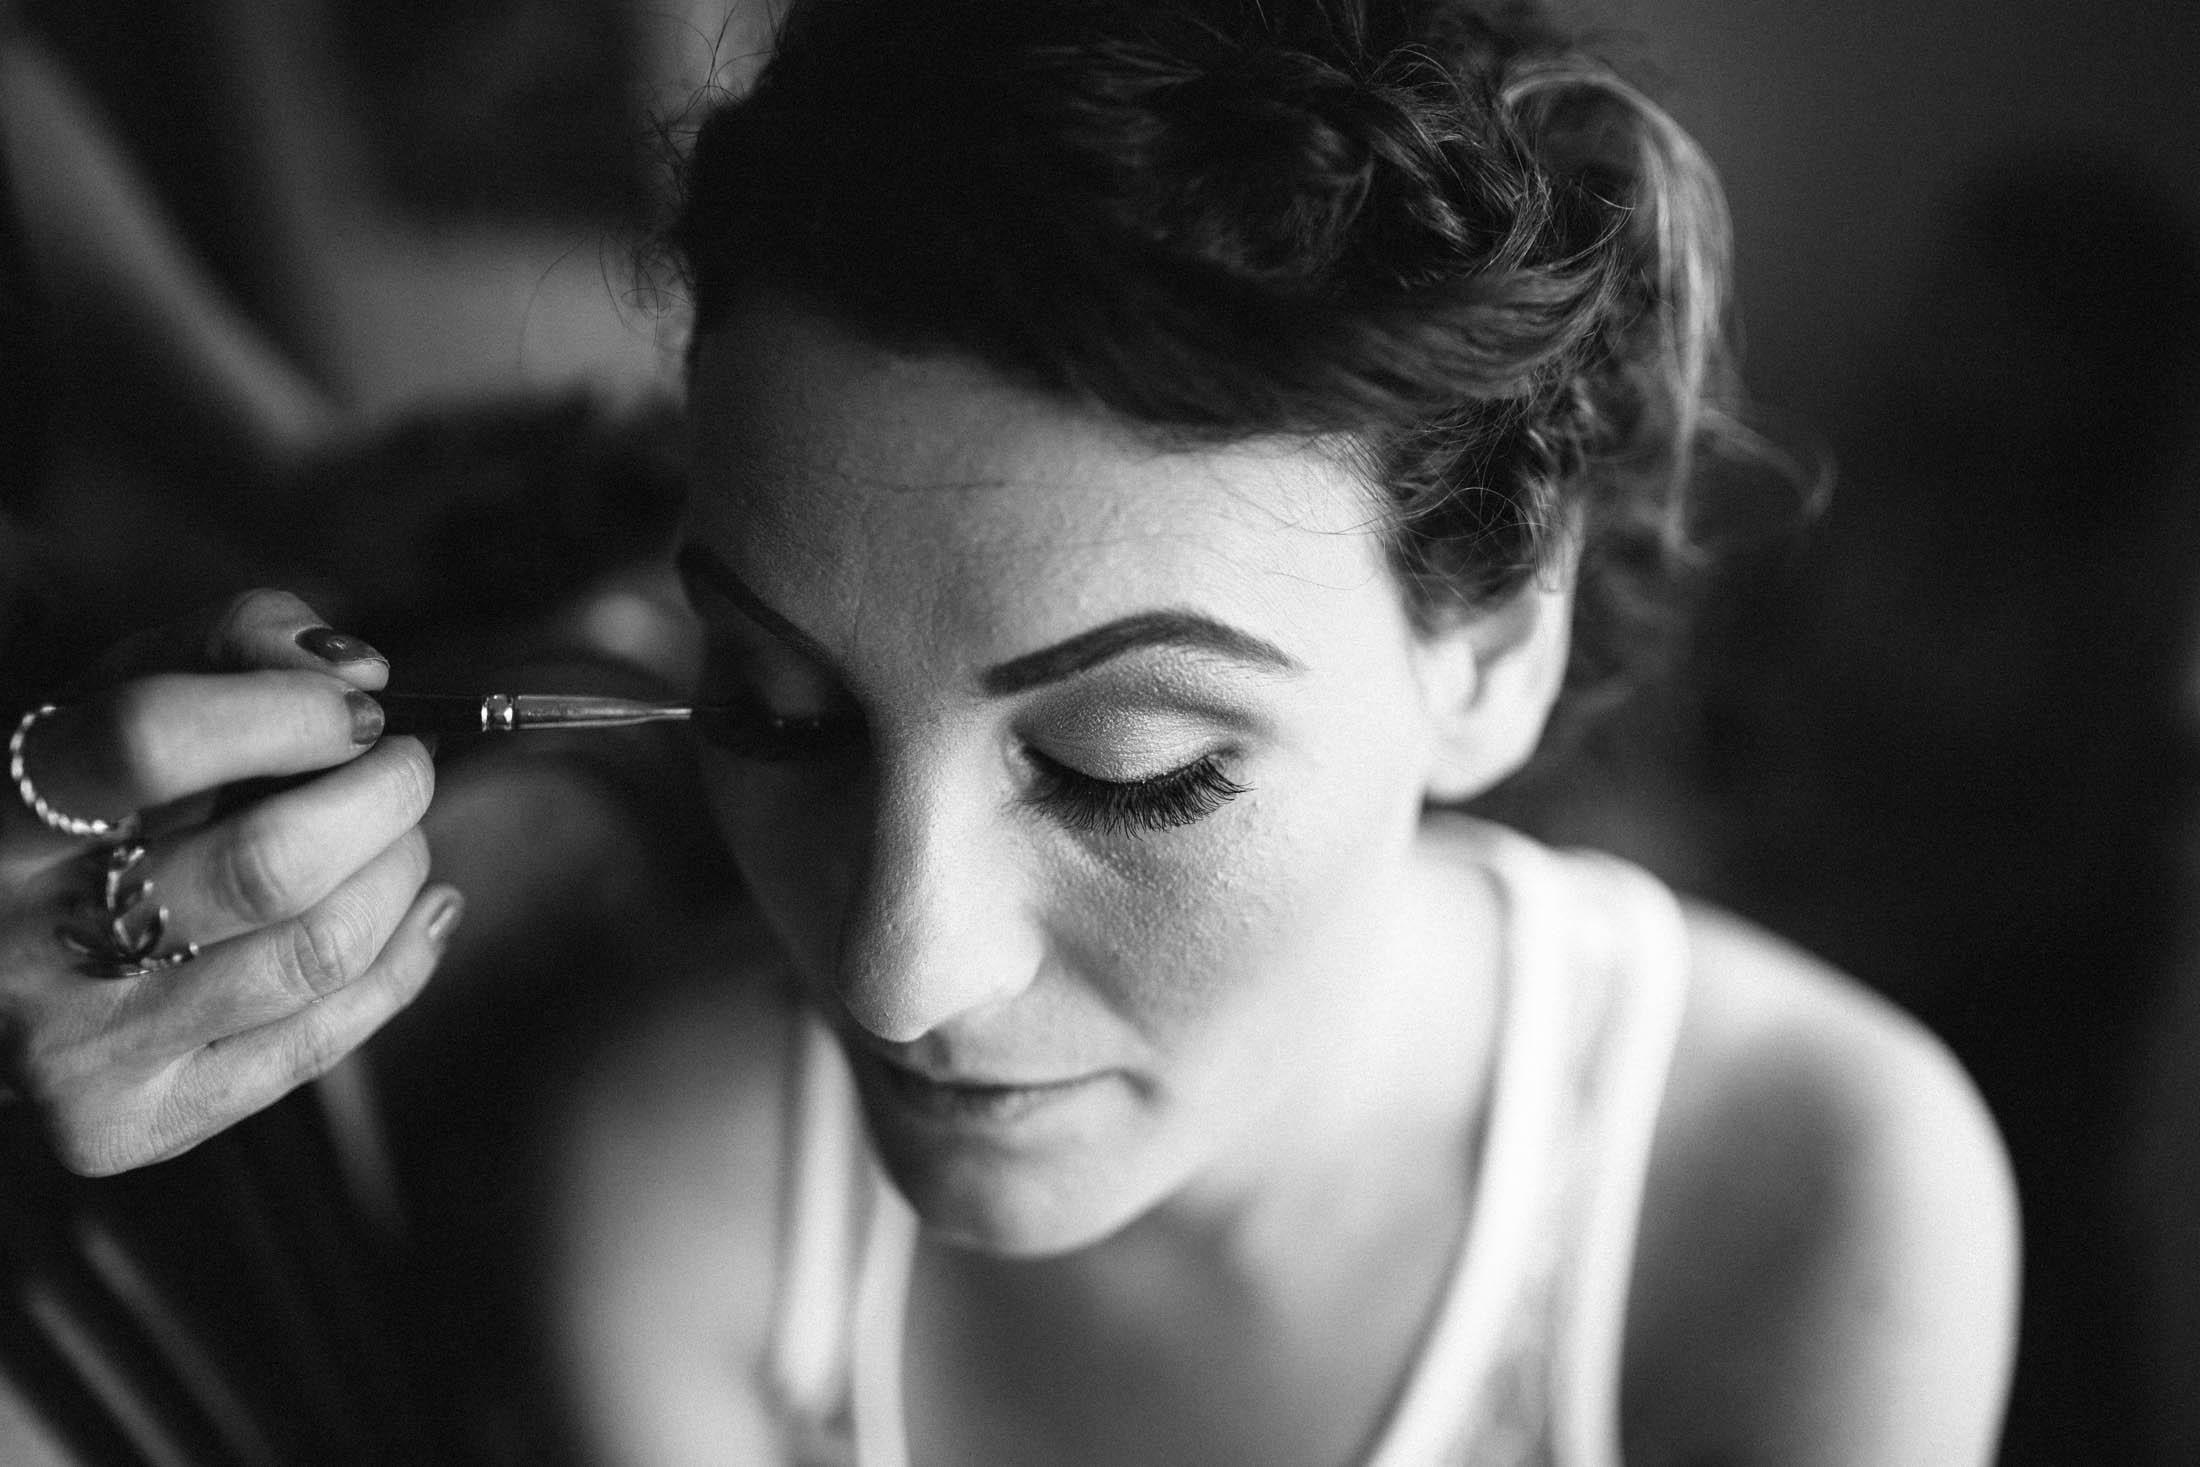 JessicaJillPhotography-LondonWedding-SouthEastWeddingPhotographer-RAC-12.jpg